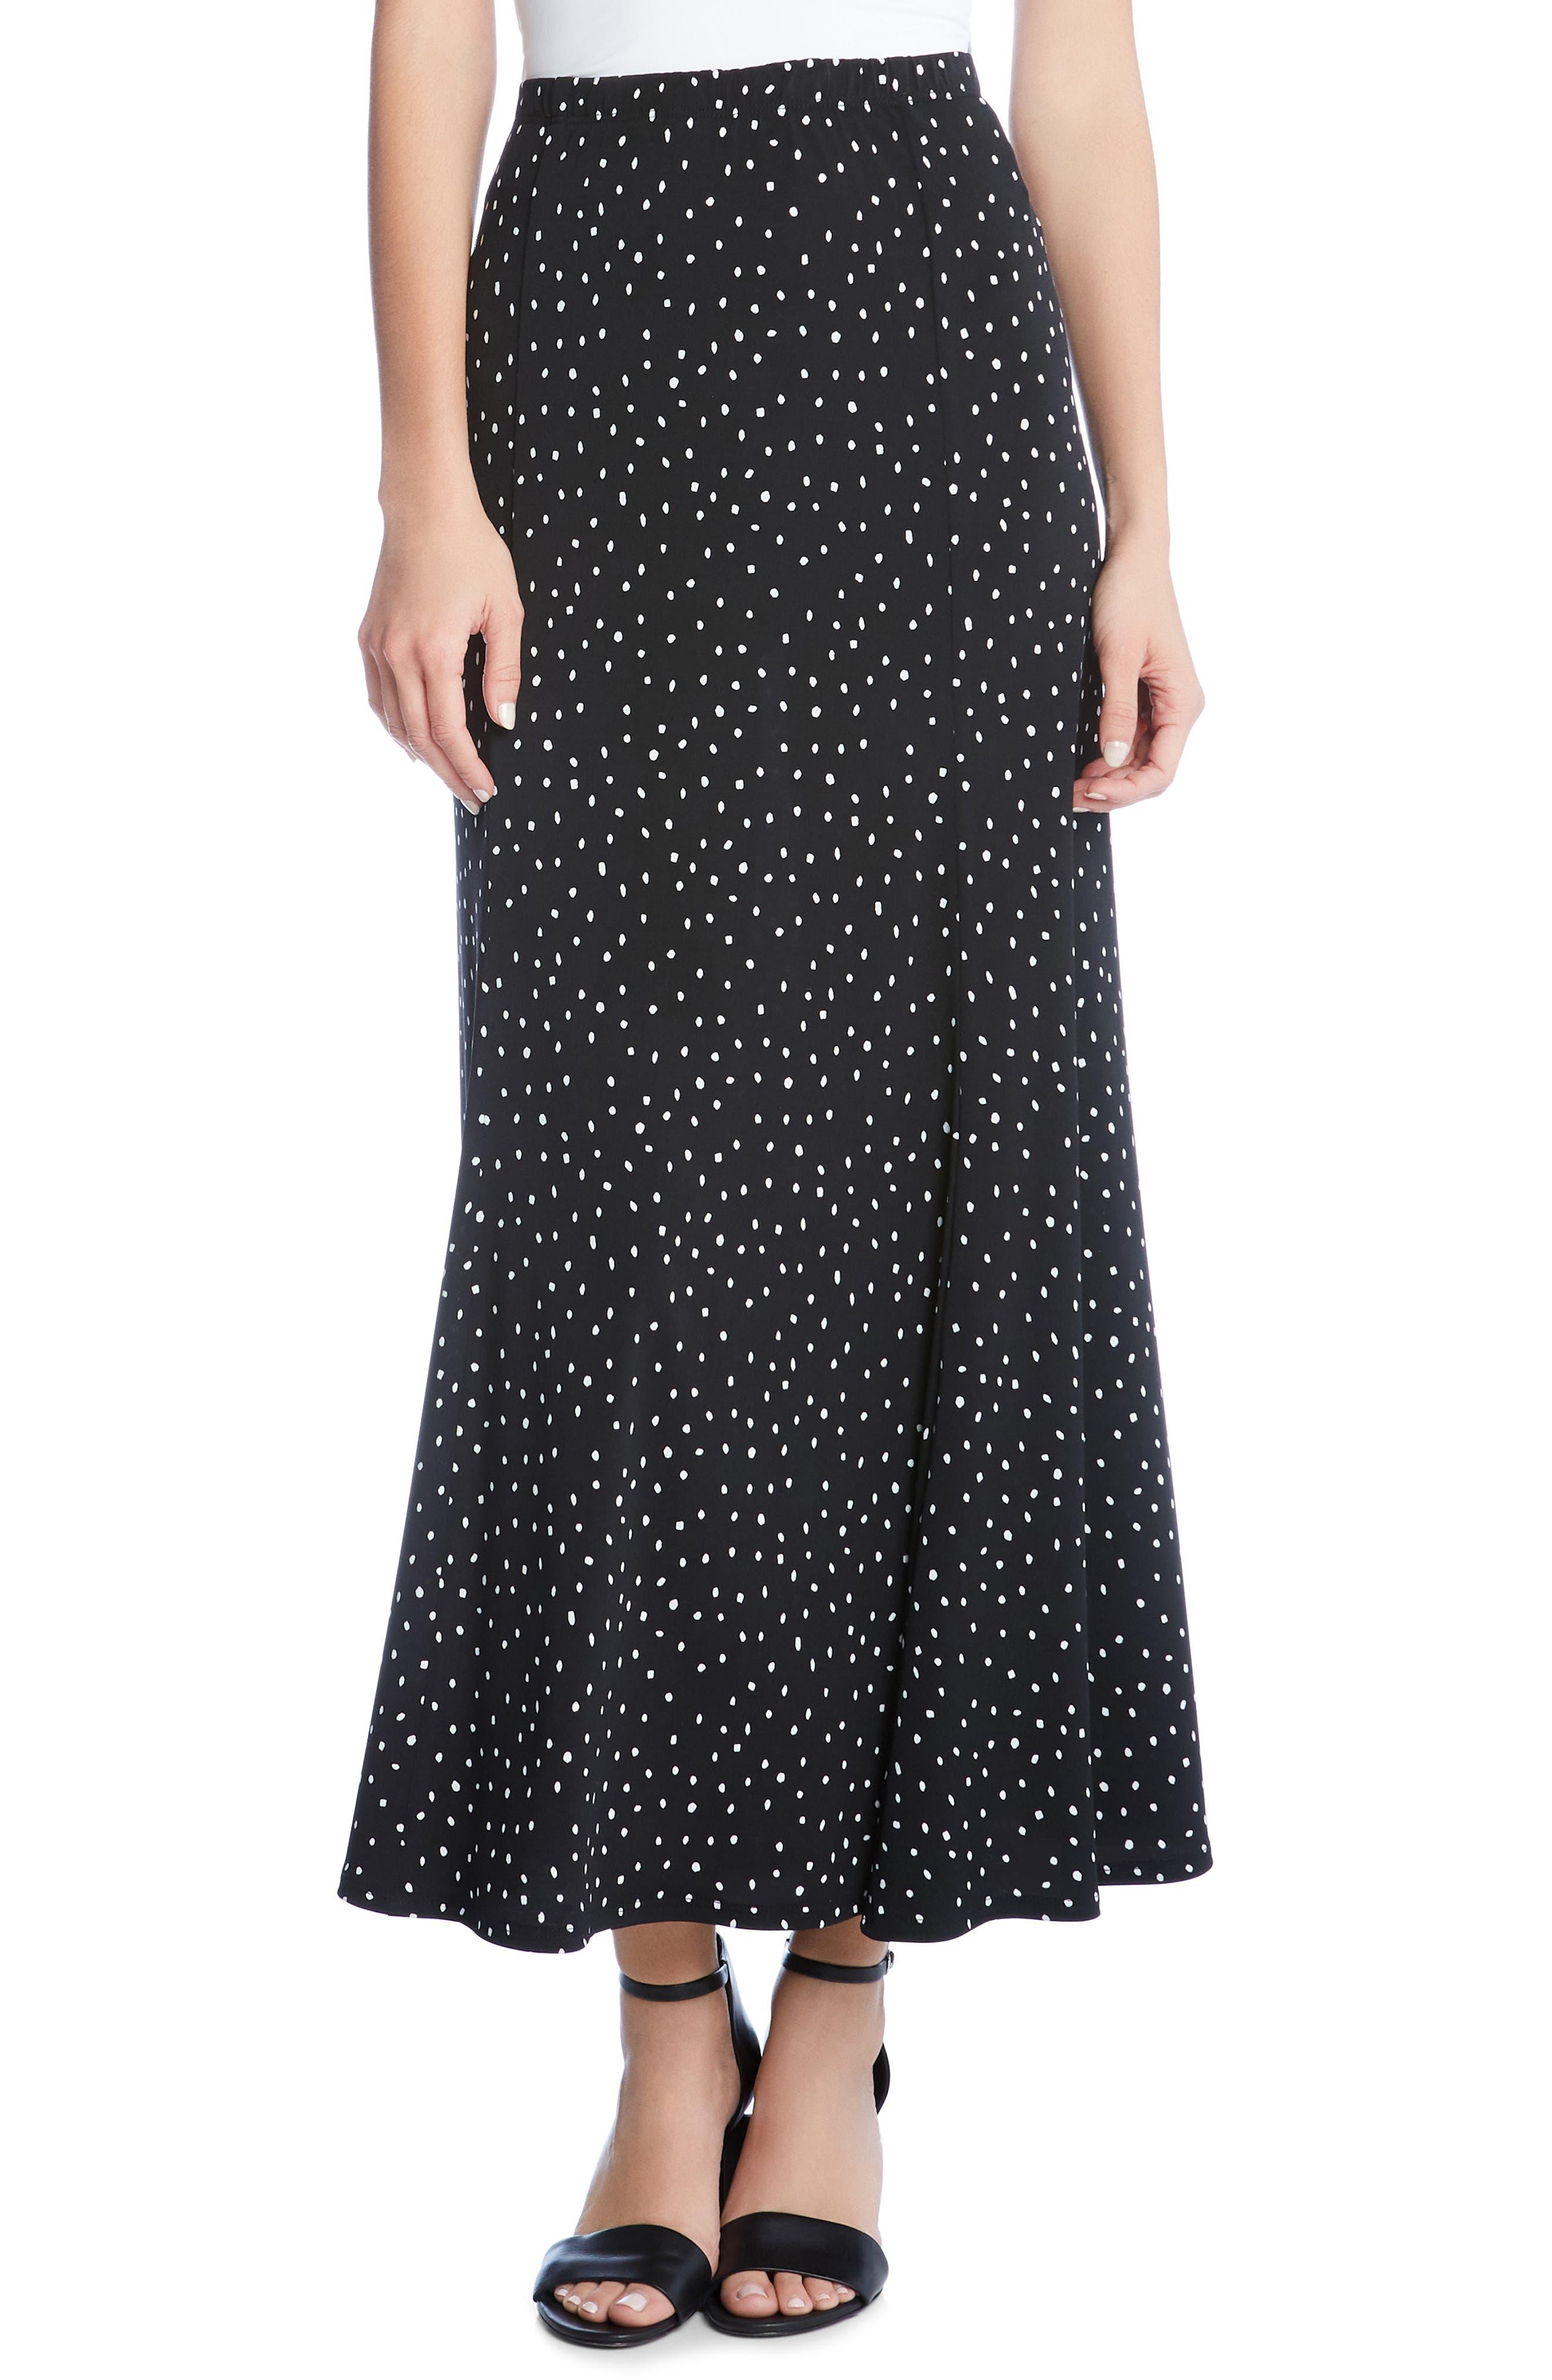 KAREN KANE, Dot Maxi Skirt, Main thumbnail 1, color, 001